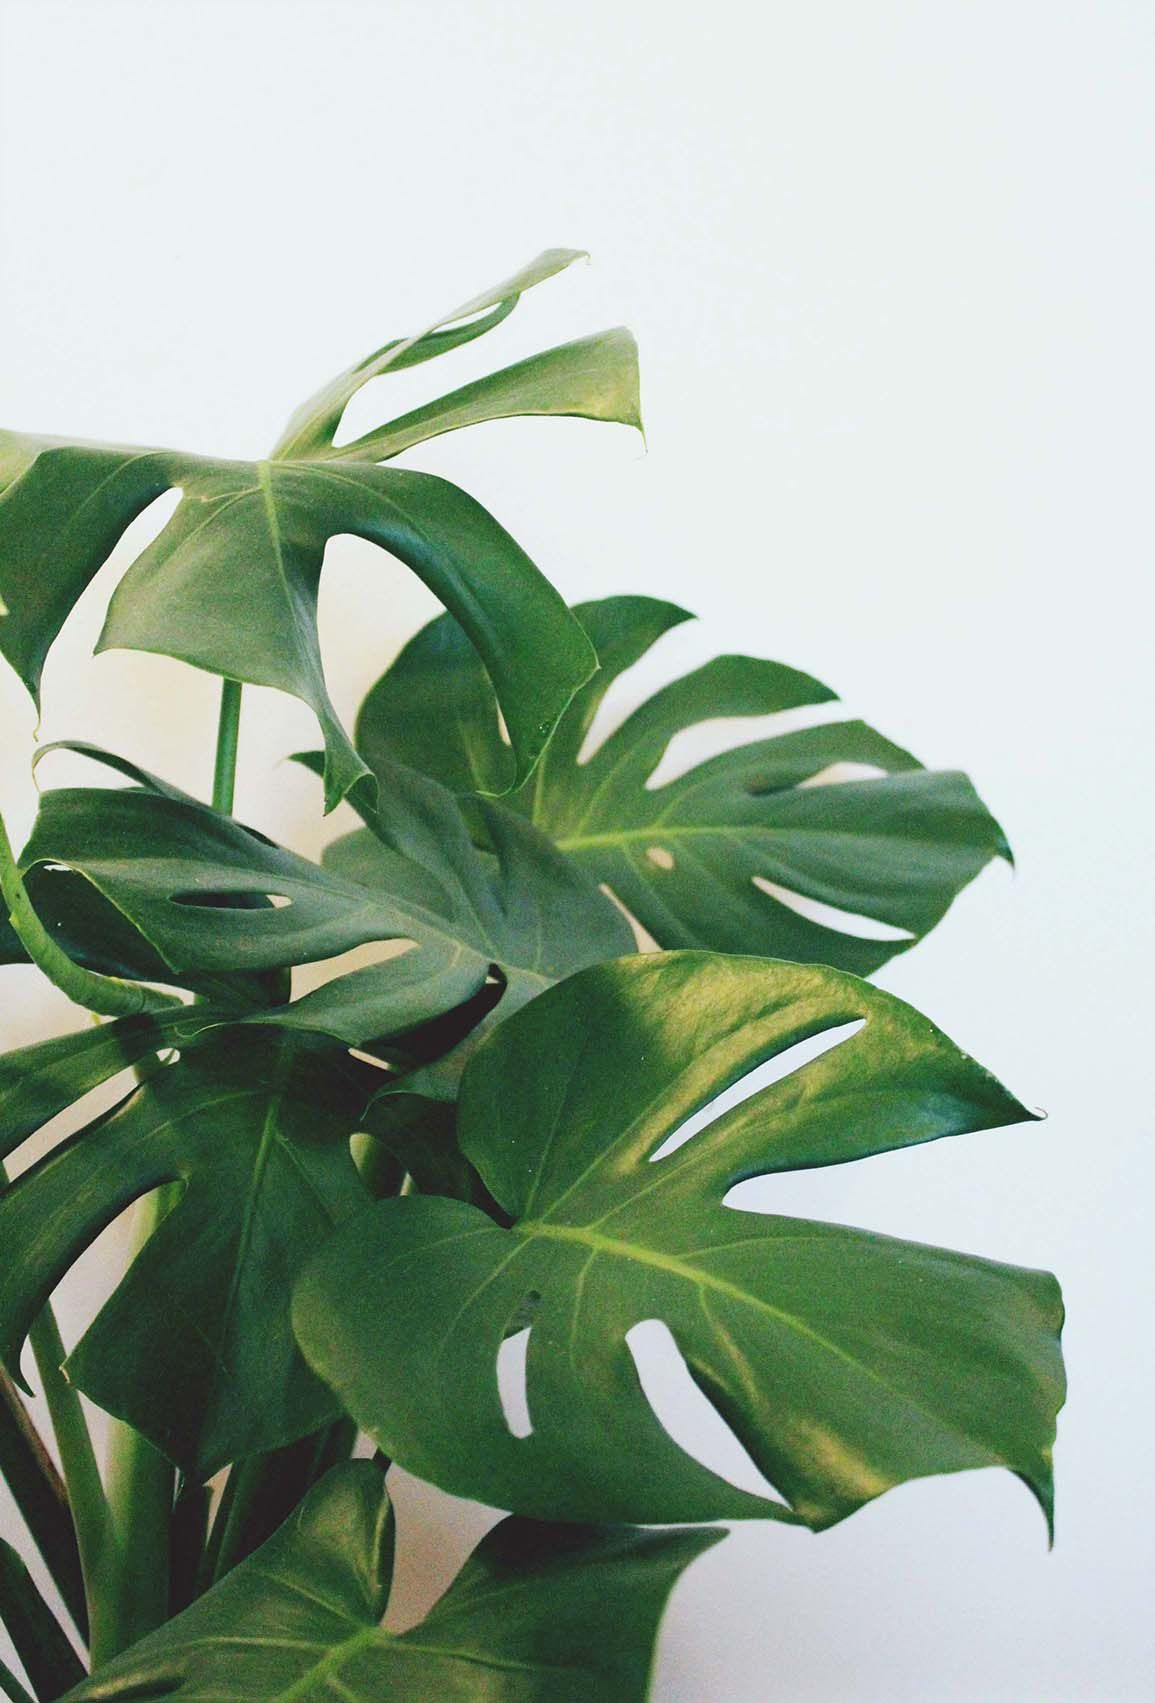 My Pretty Split Leaf Philodendron Plants Tropical Plants